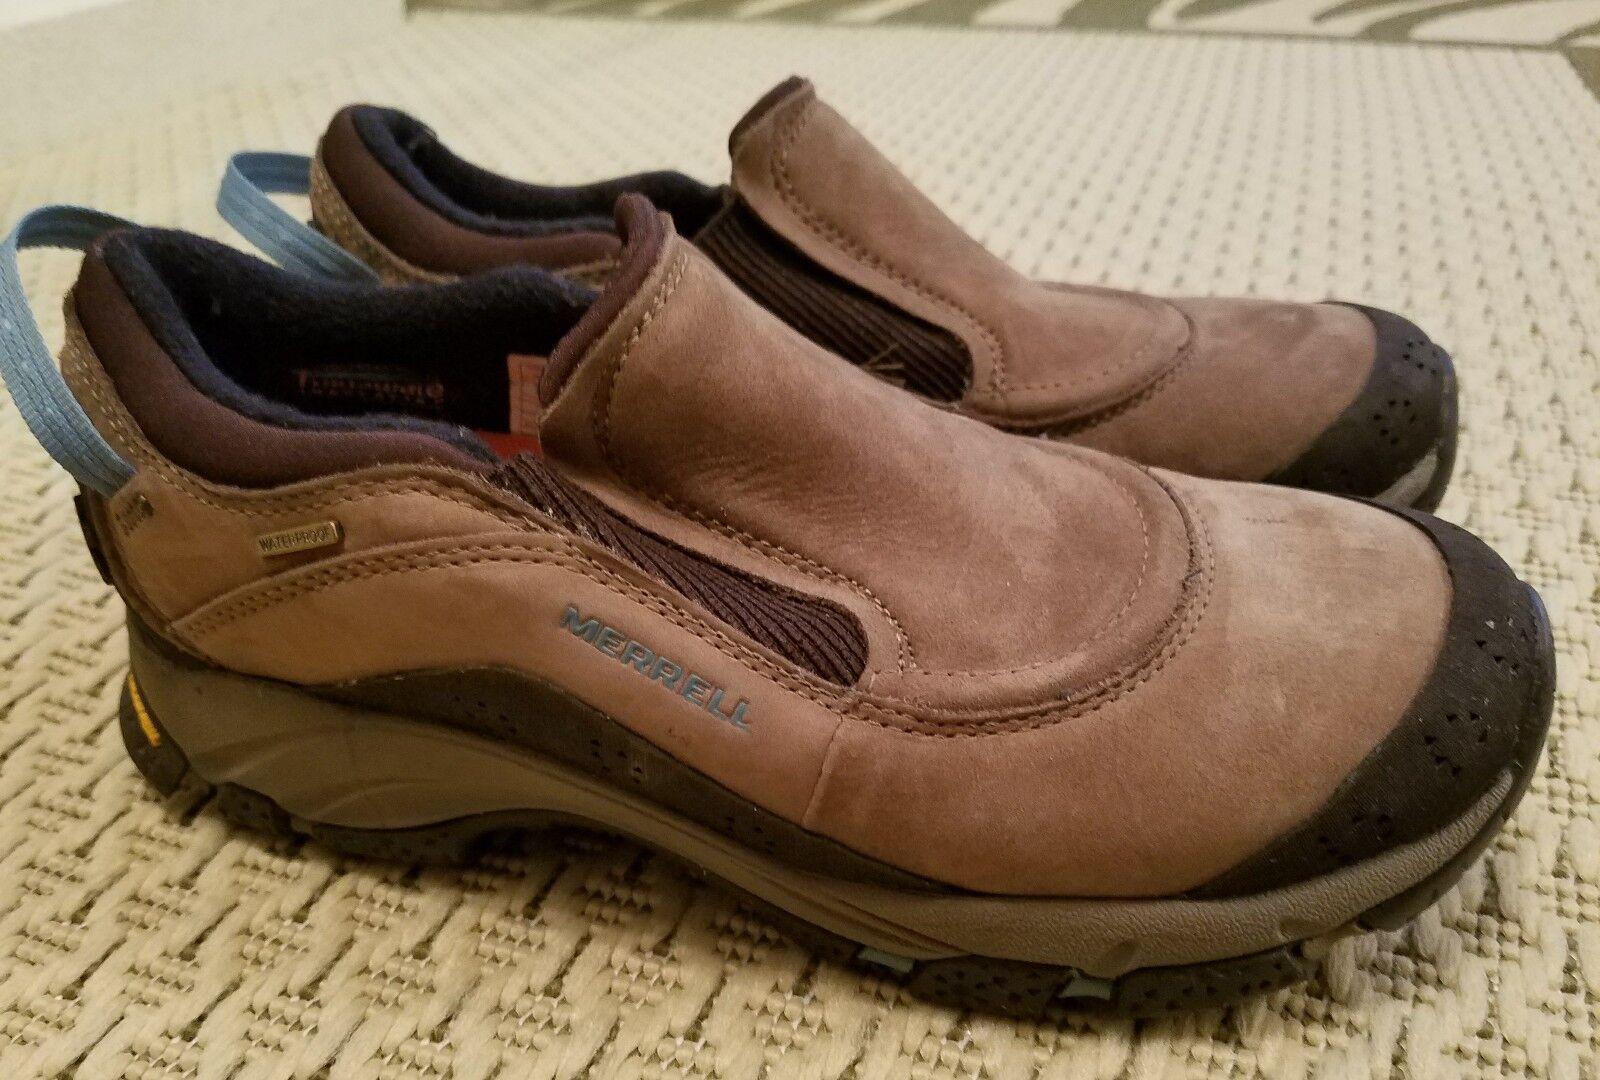 Damenschuhe MERREL THERMO ARCH CRYSTAL WATERPROOF Schuhe SZ 6 M 110 RETAIL